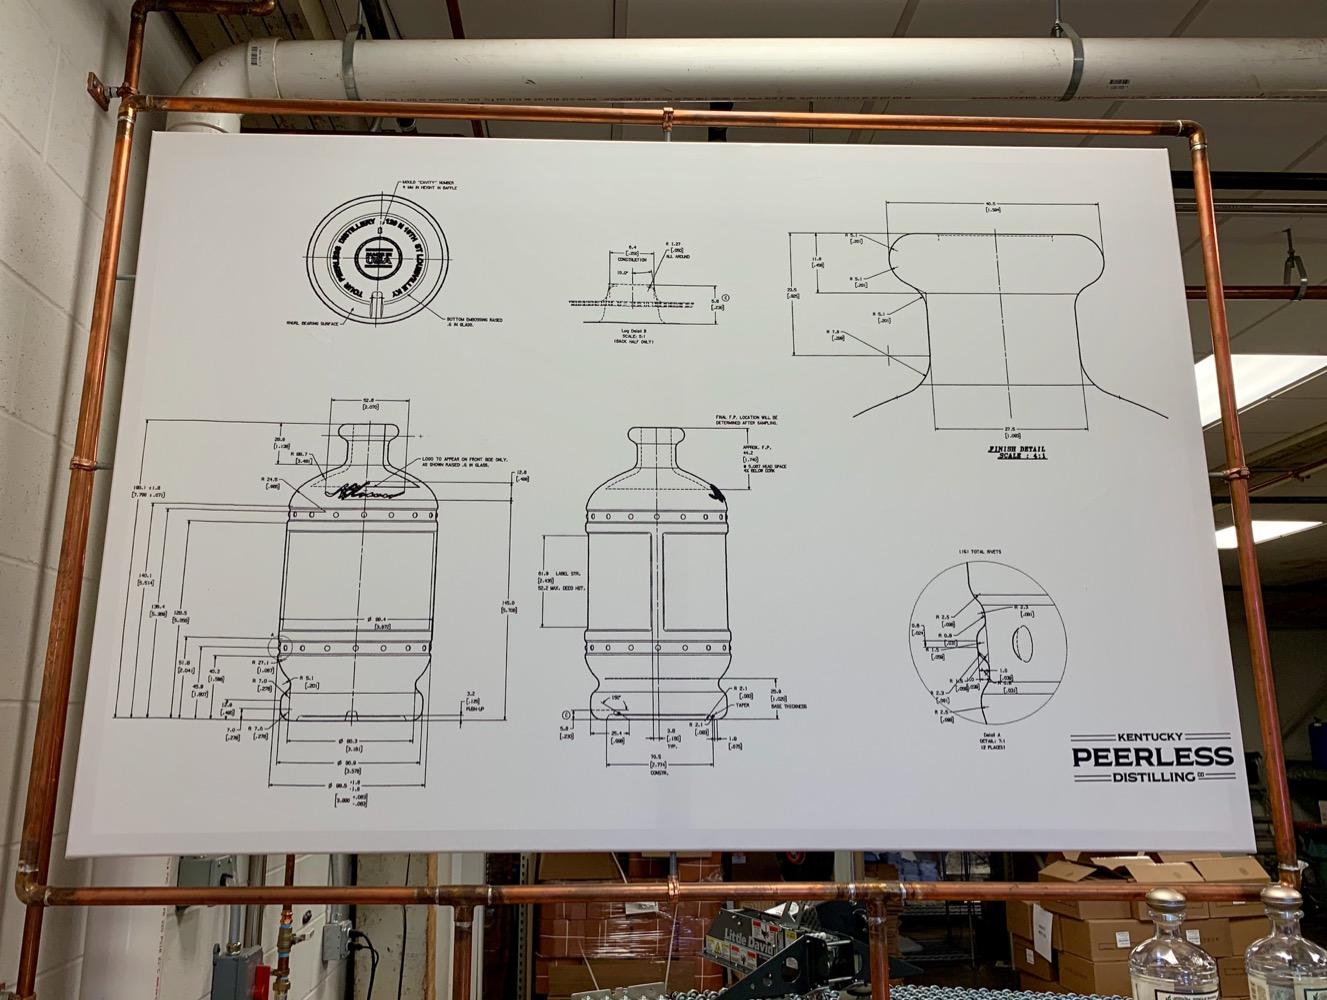 Kentucky Peerless Distilling - Bottle Design